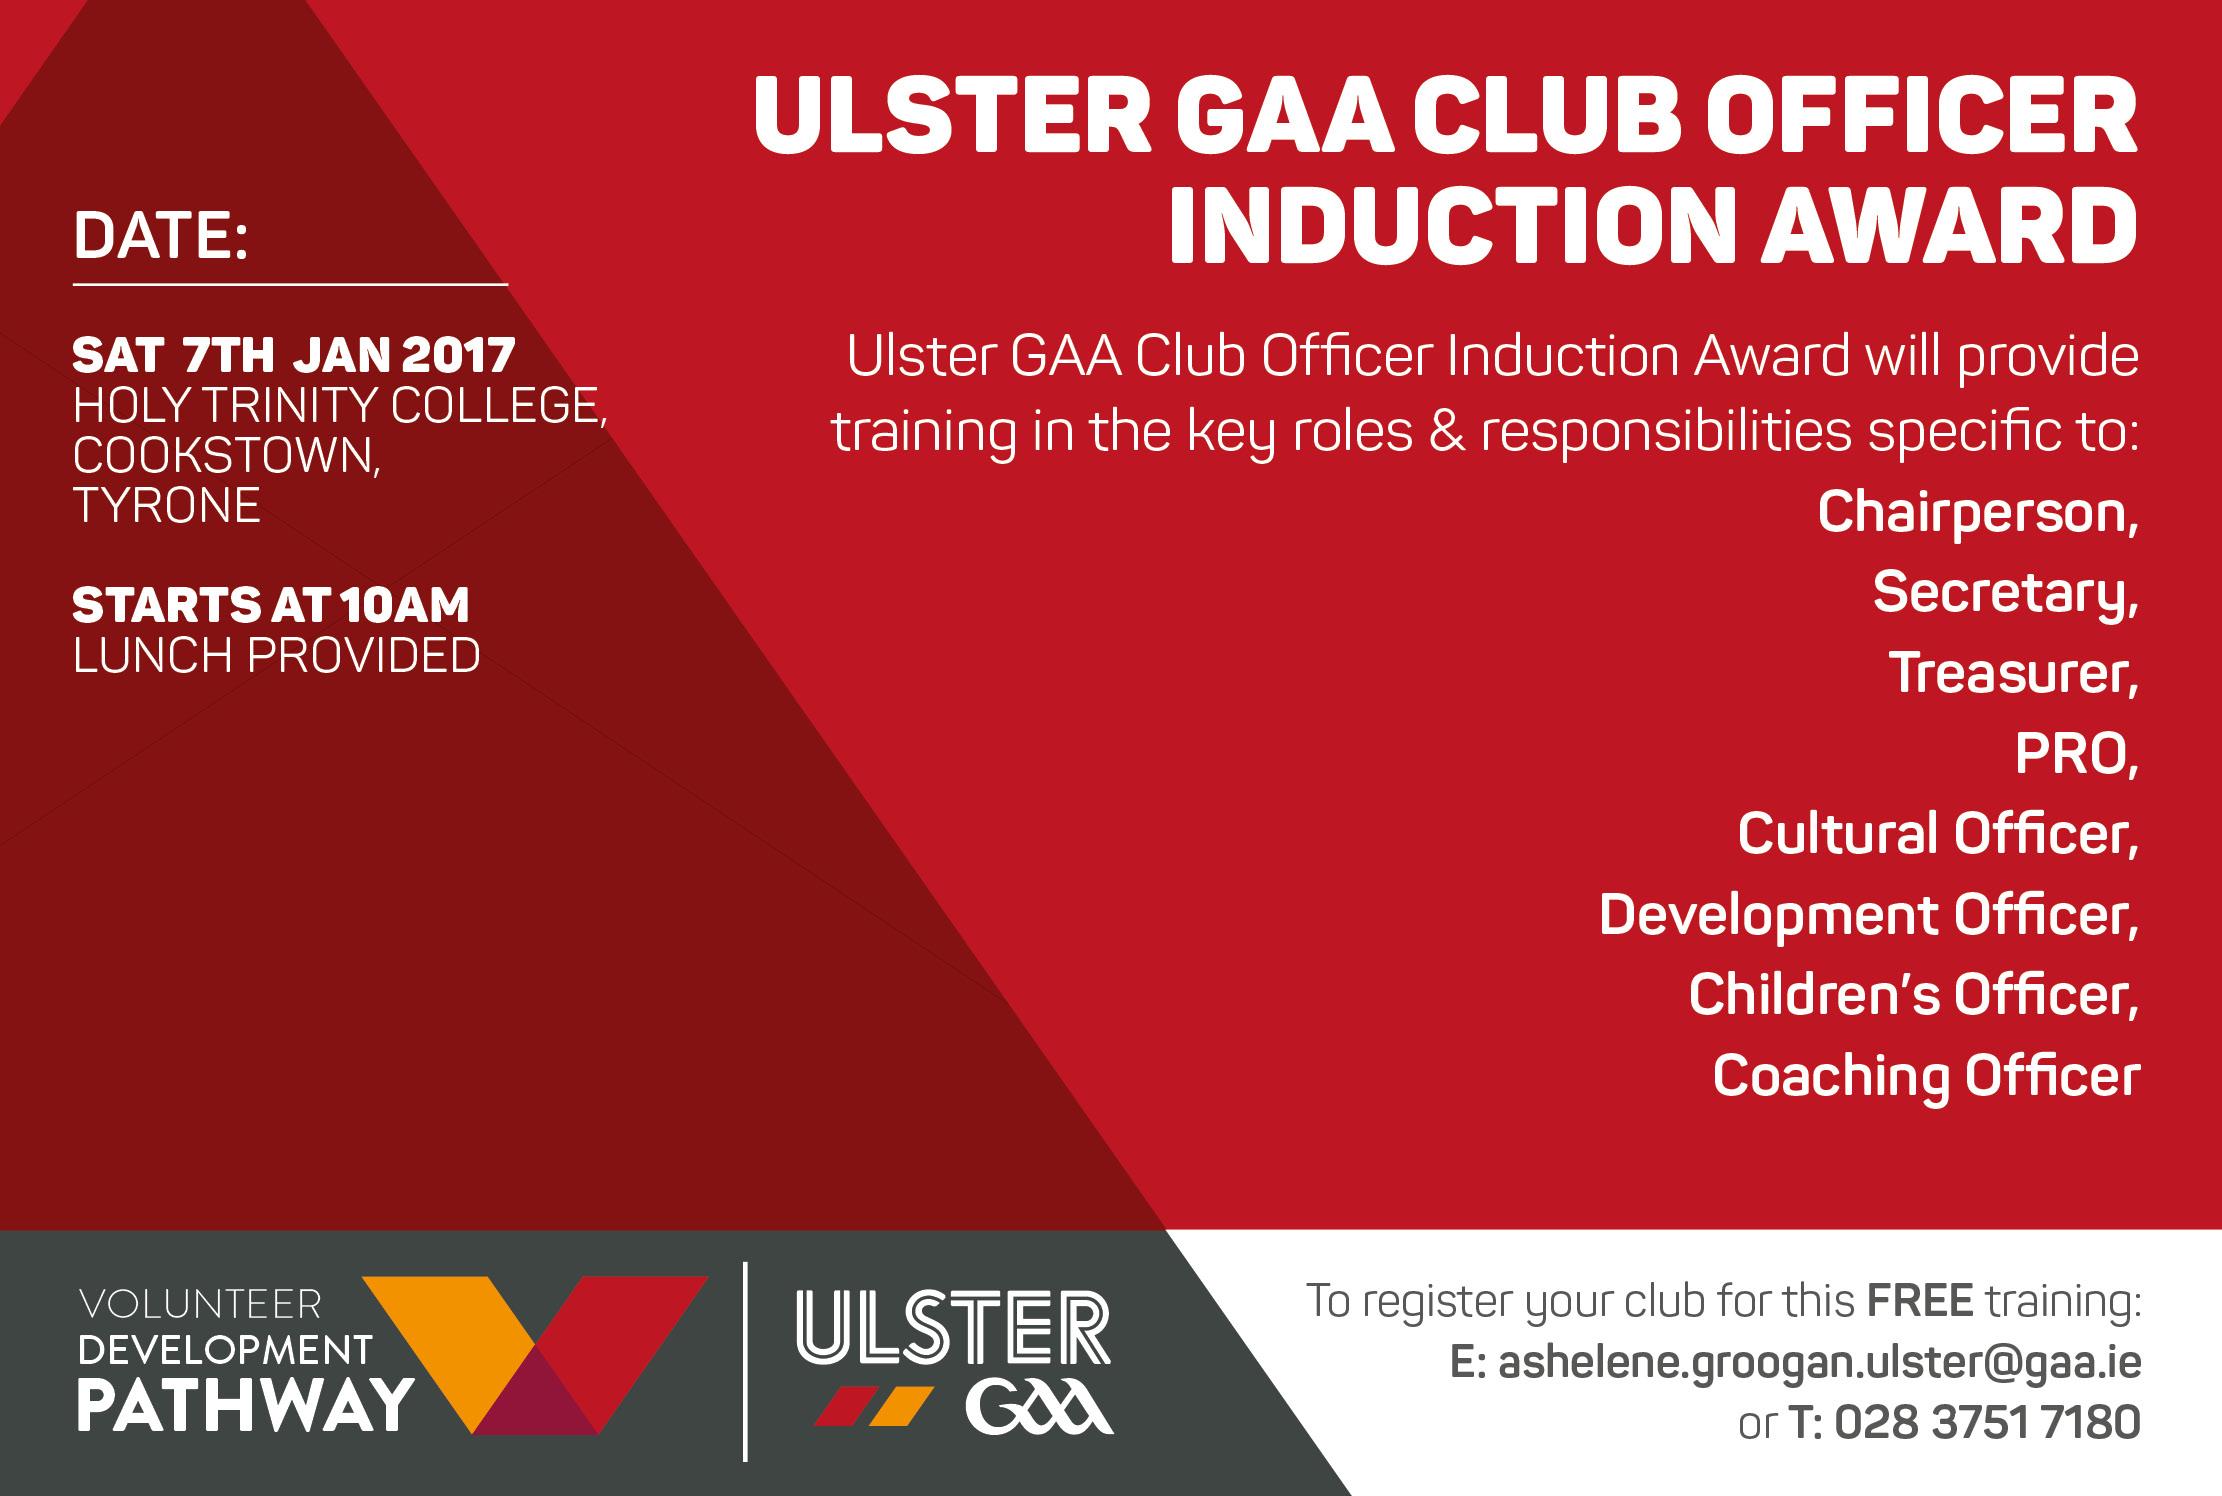 Ulster GAA Club Officer Induction Award